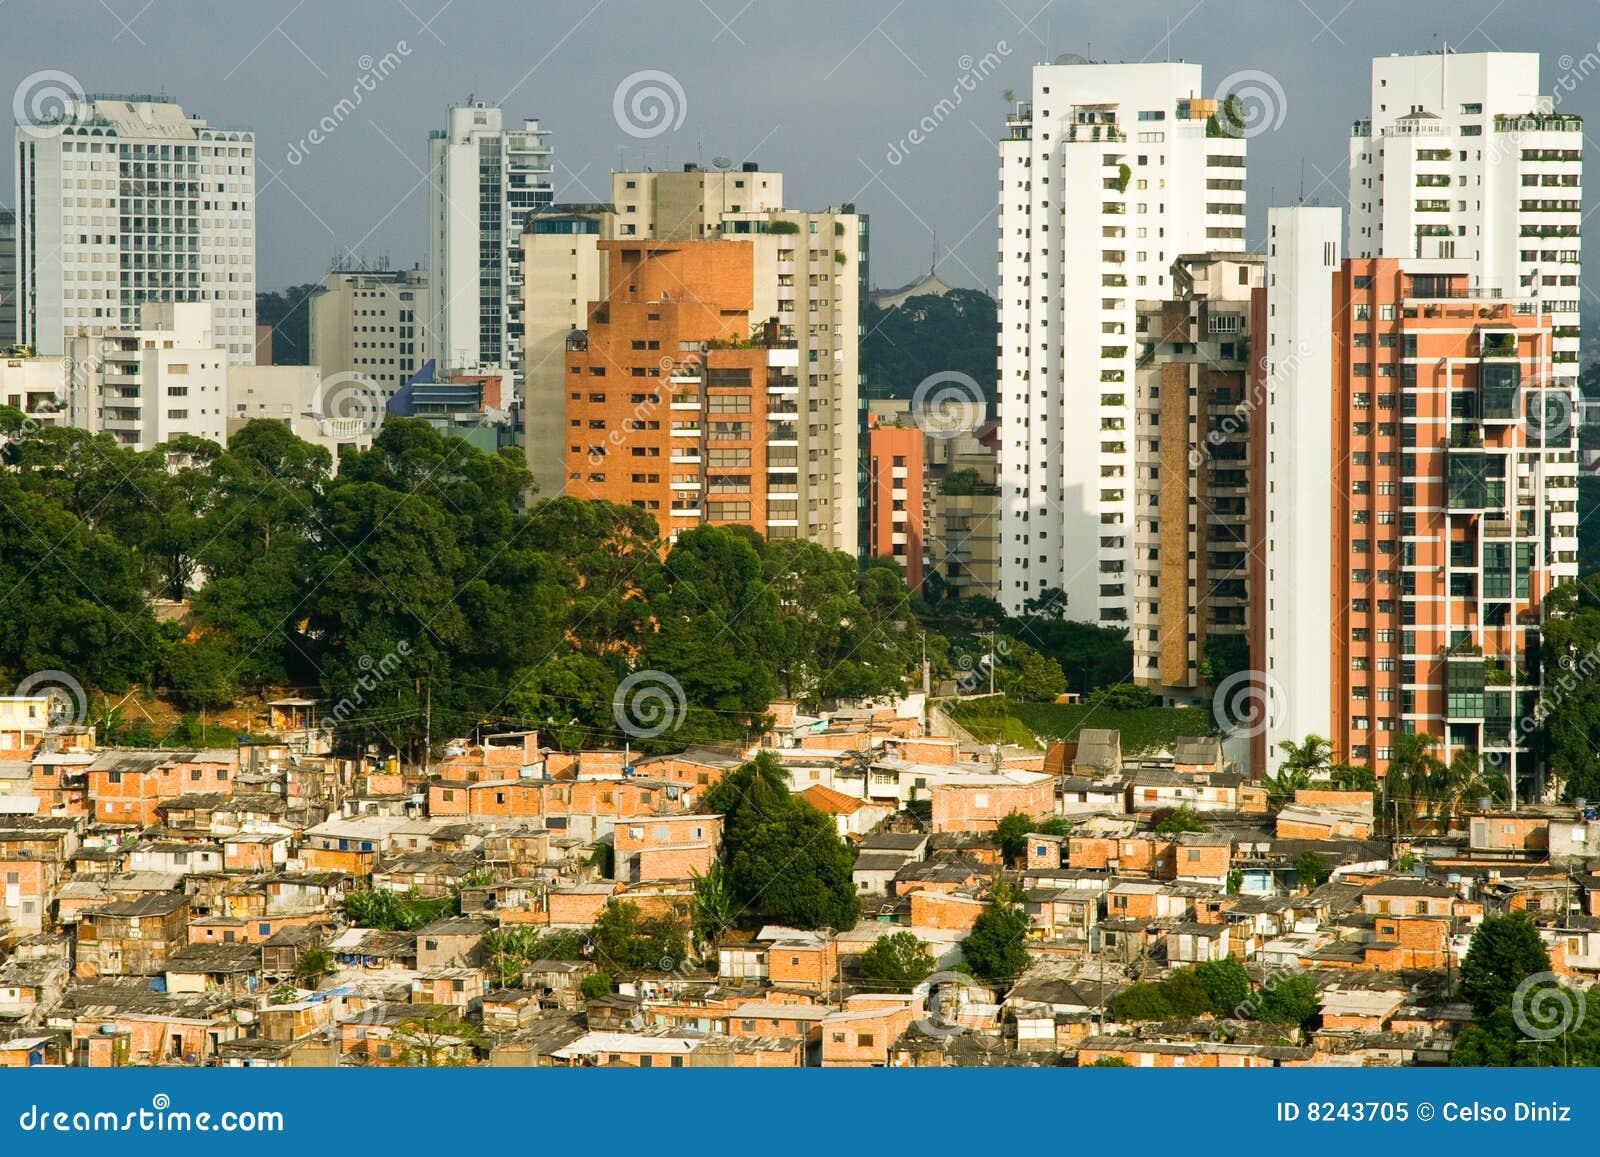 Paysage urbain de sao paulo image stock image 8243705 for Paysage de ville